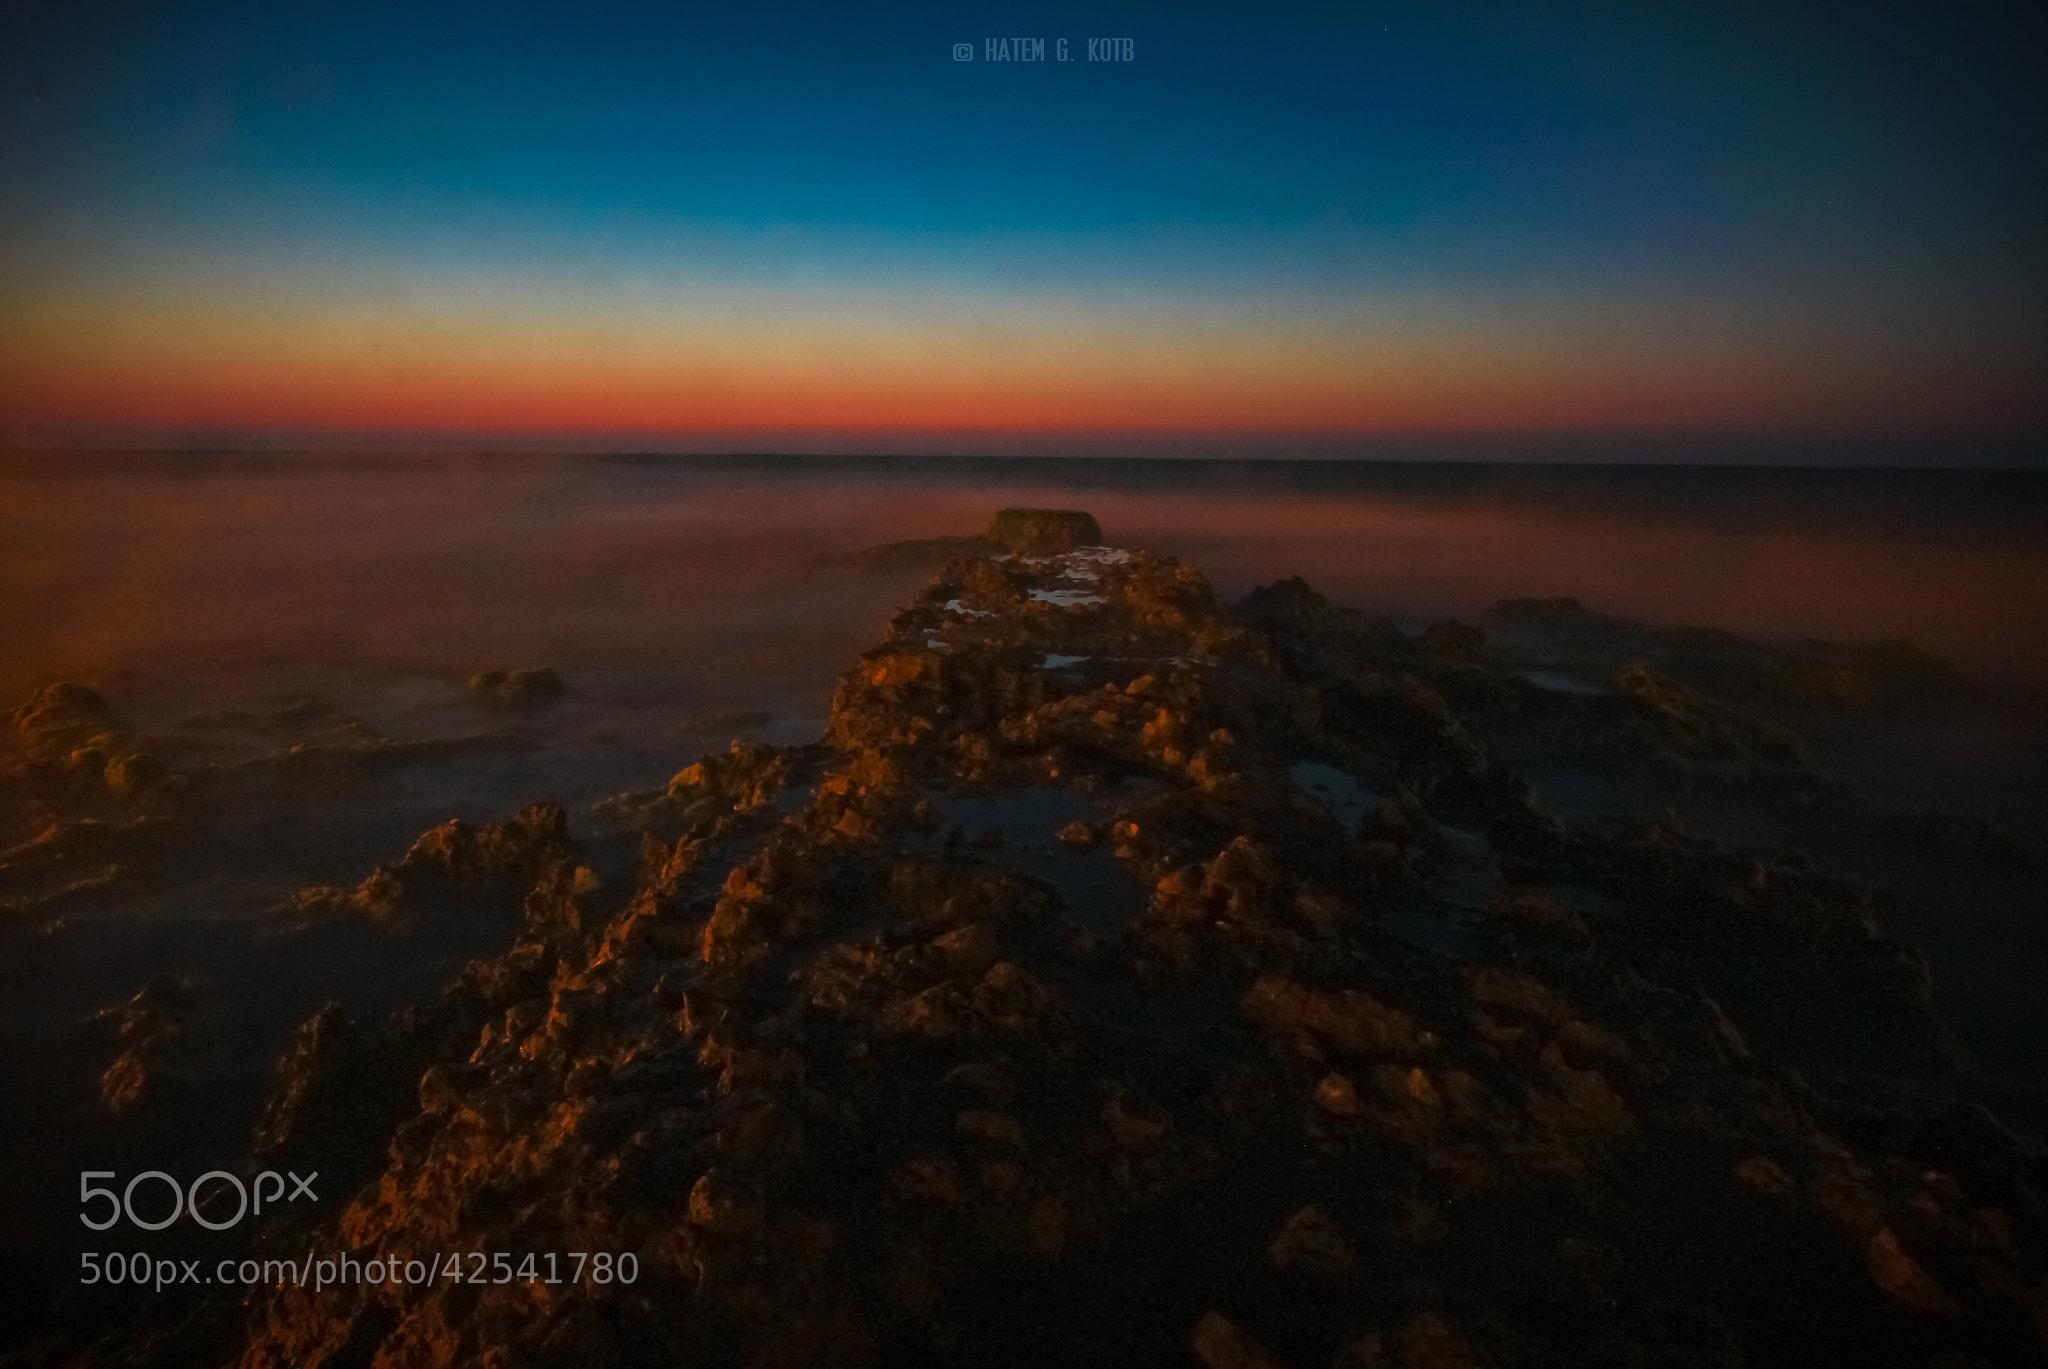 Photograph Splendor by Hatem Kotb on 500px